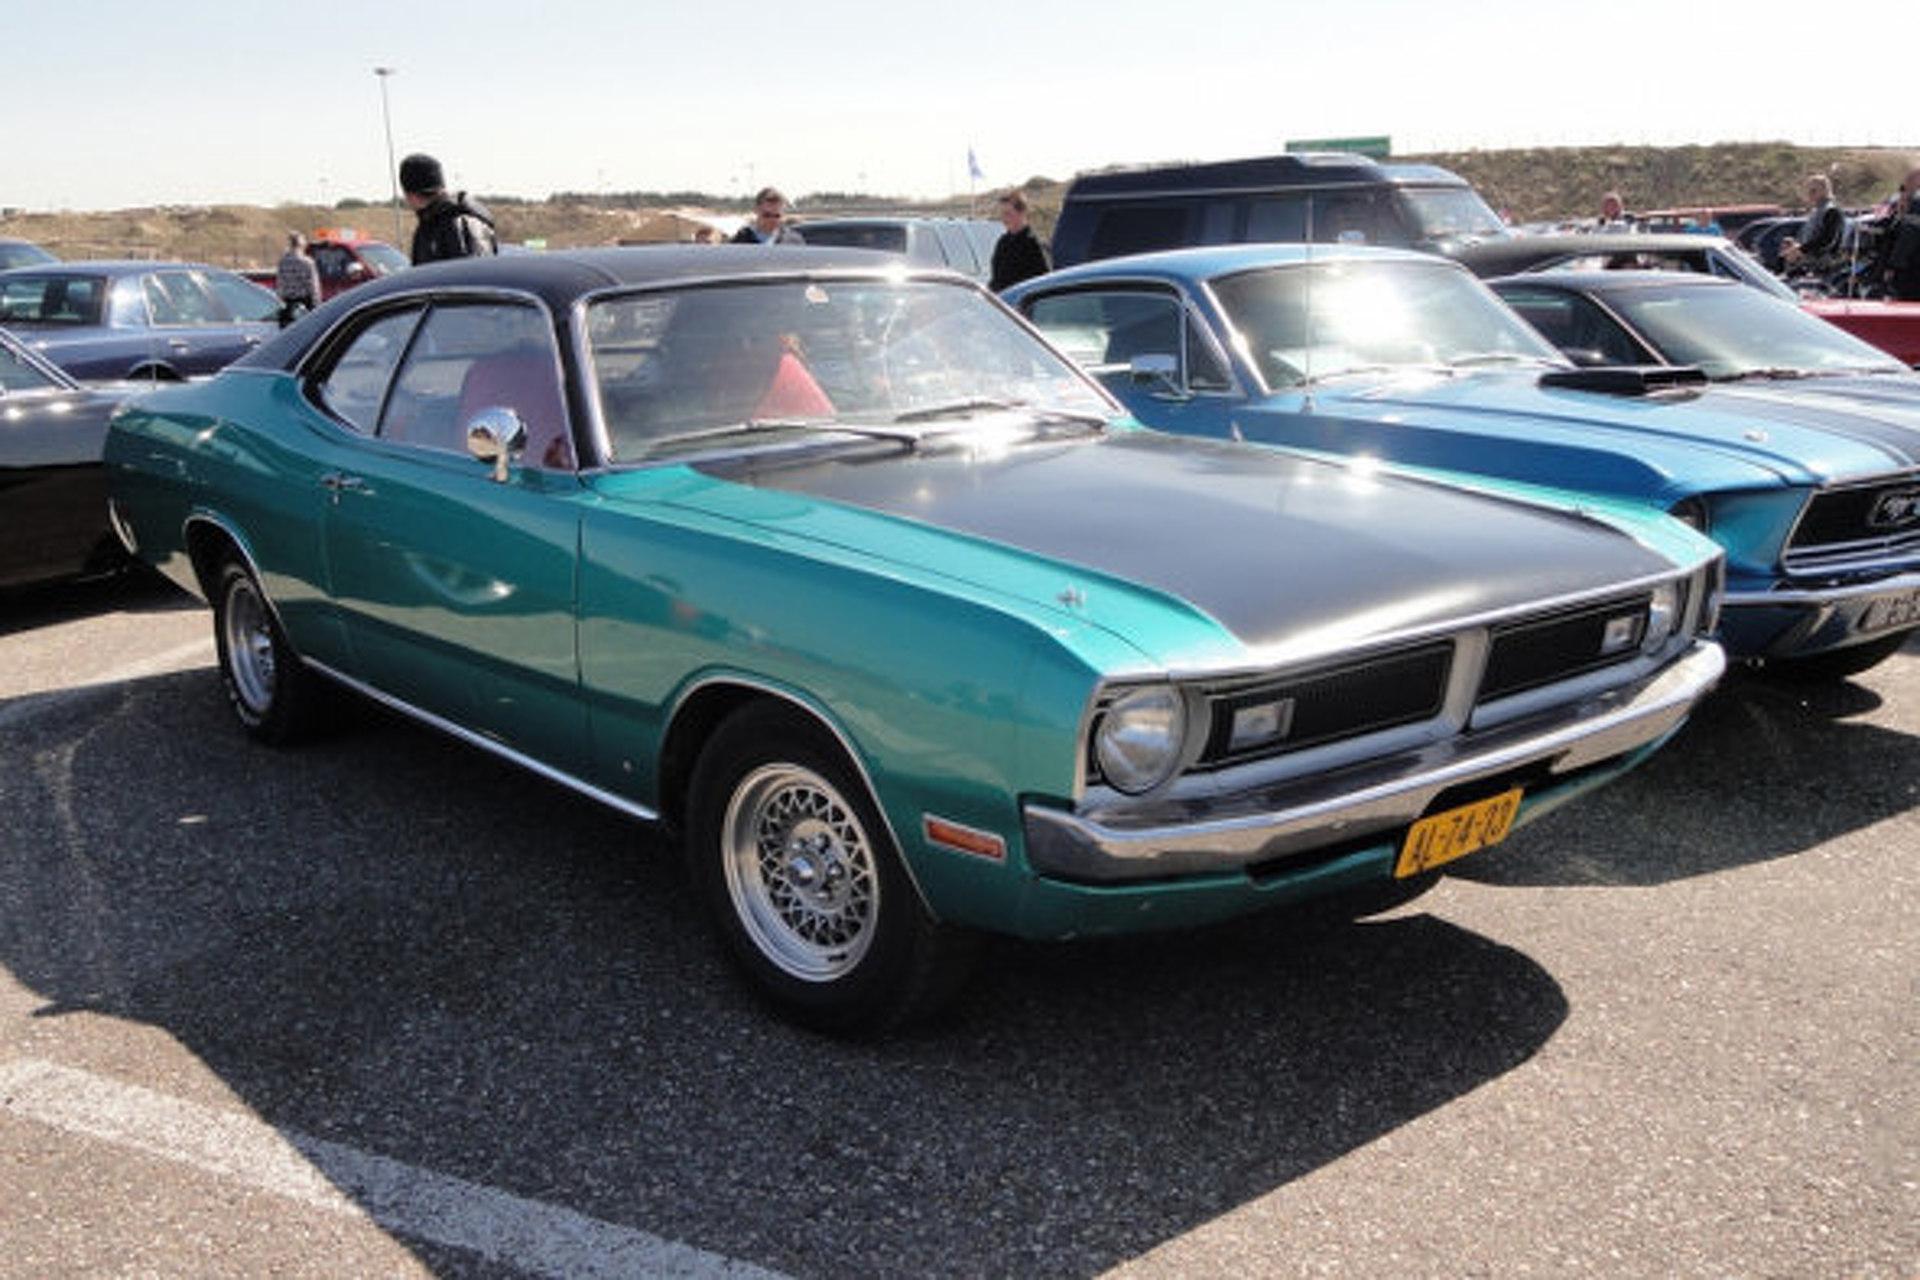 The 1970 Dodge Demon: Scary Name, Helluva Car